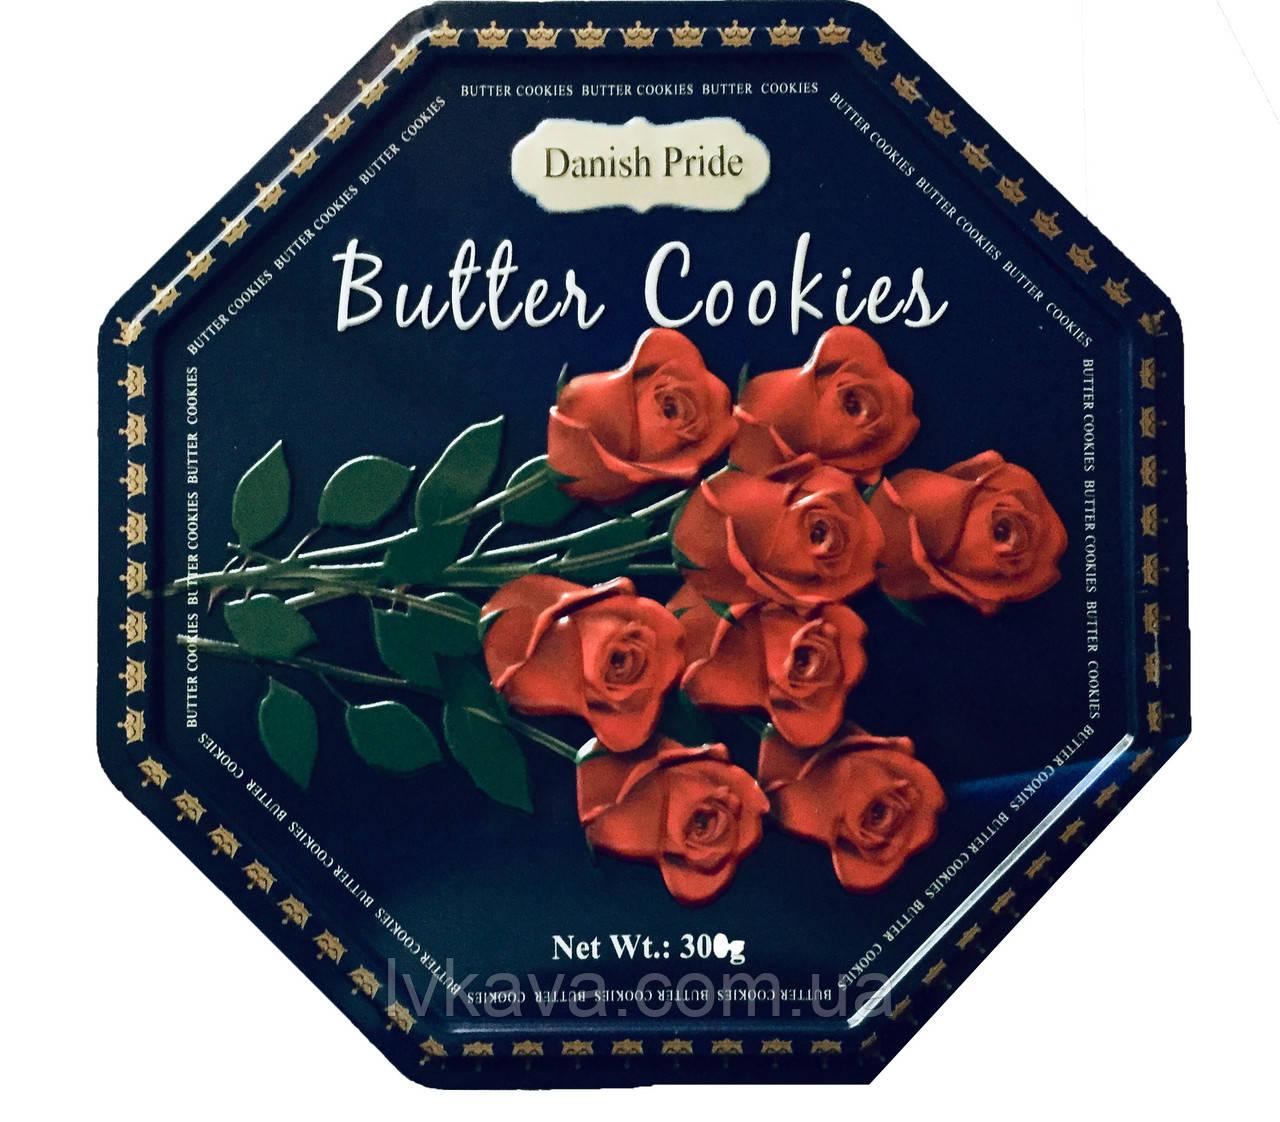 Печенье ассорти Butter cookies Розы Danish Pride, 300 гр, ж\б